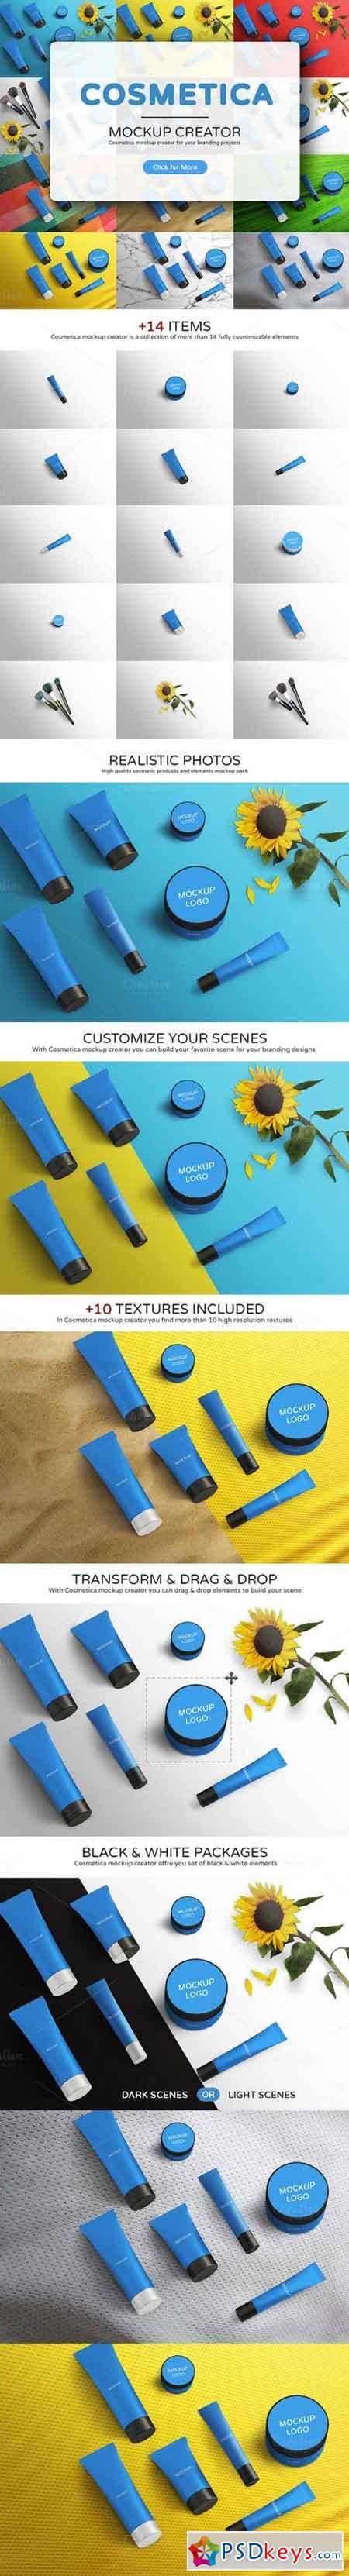 Cosmetica Mockup Creator 981709